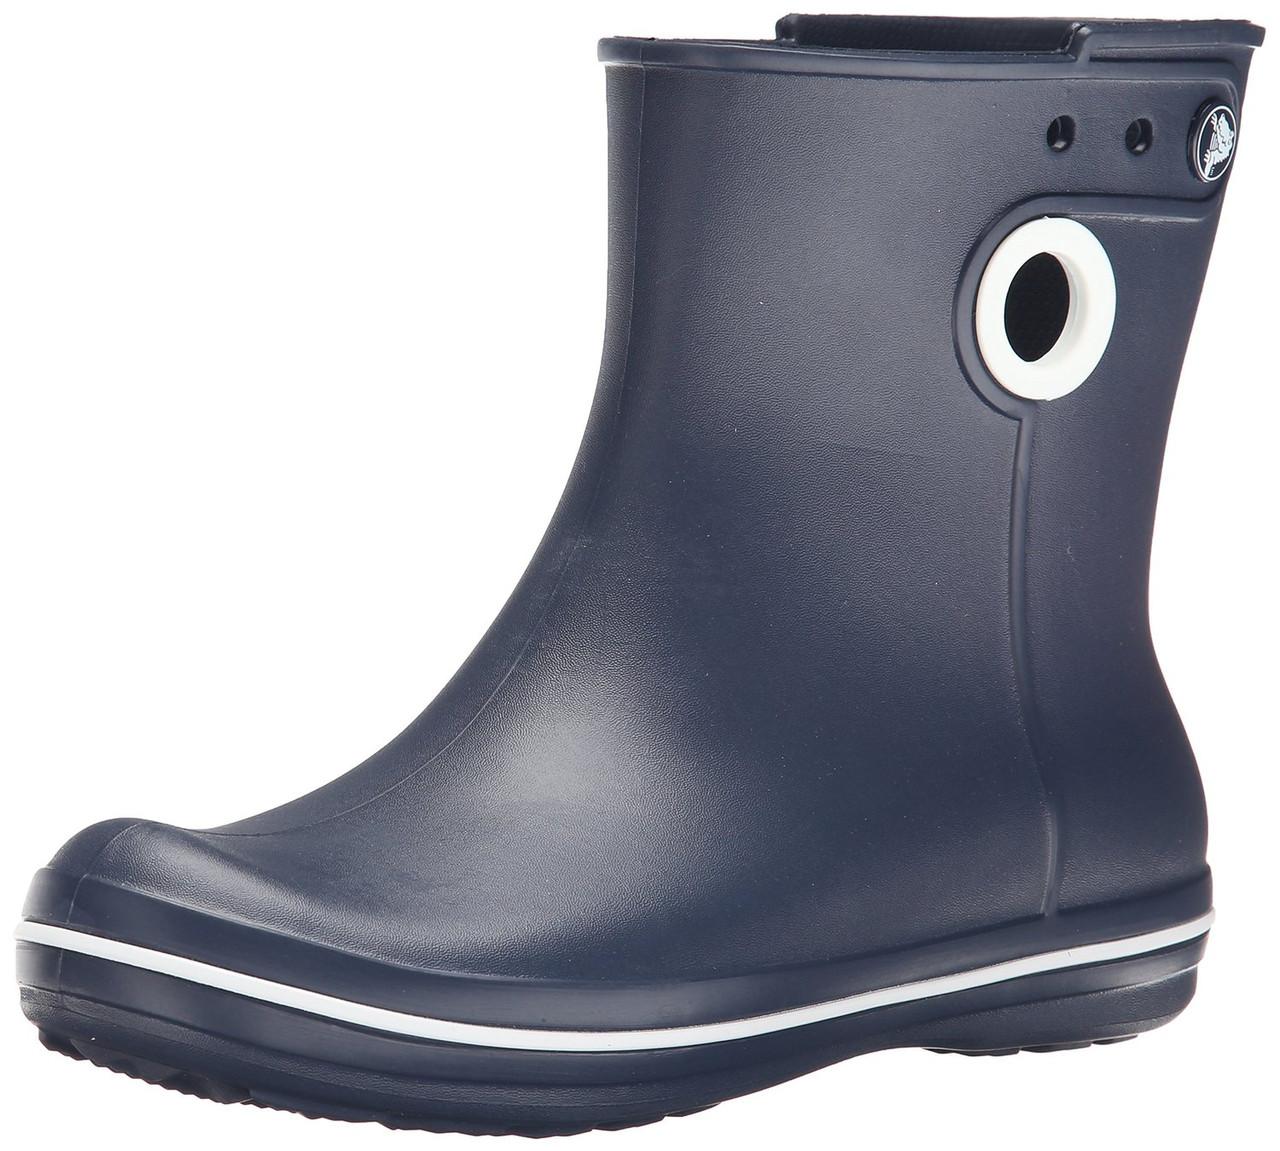 Crocs Jaunt Shorty, Women's Rain Boots